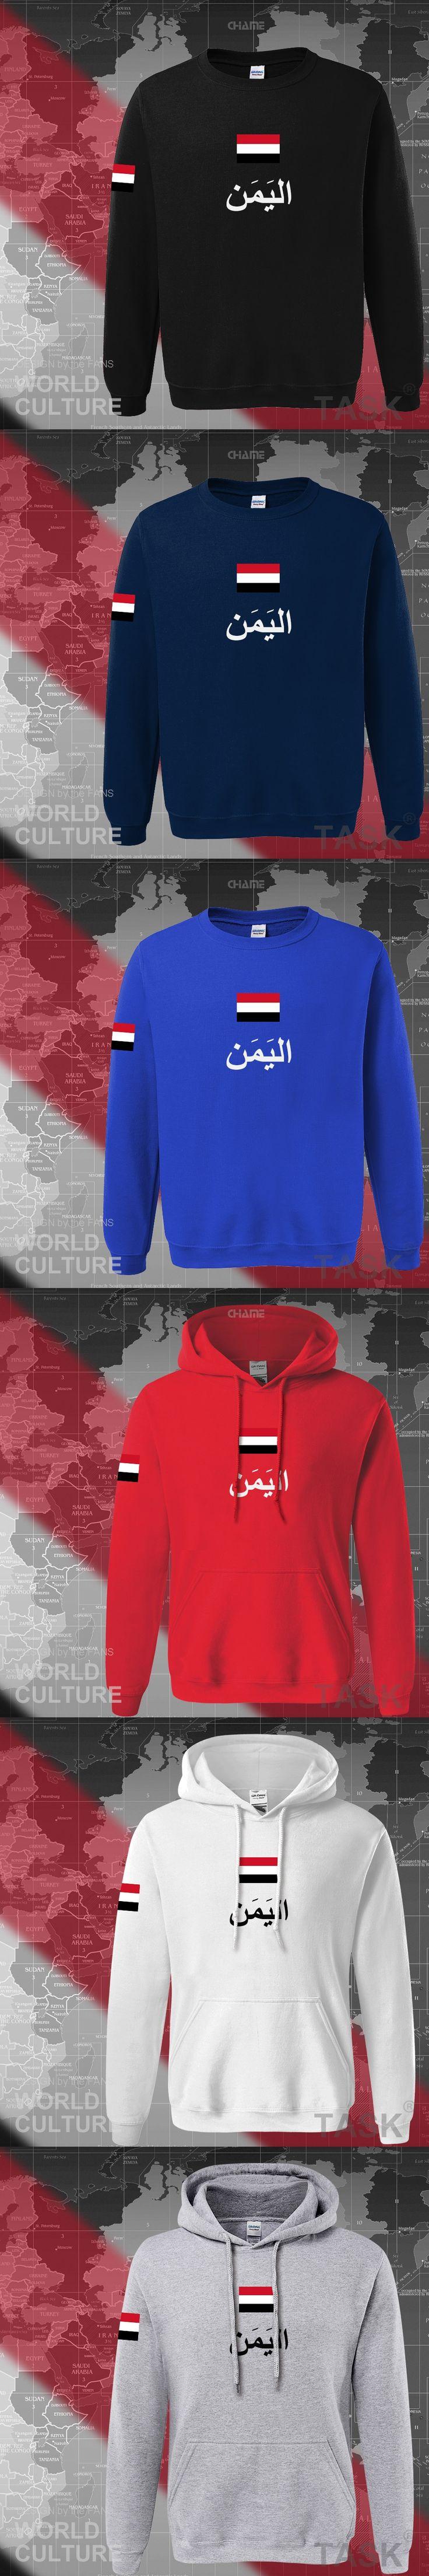 Yemen Yemeni Arabi hoodies men sweatshirt sweat new hip hop streetwear clothing top sporting tracksuit nation country YEM Islam